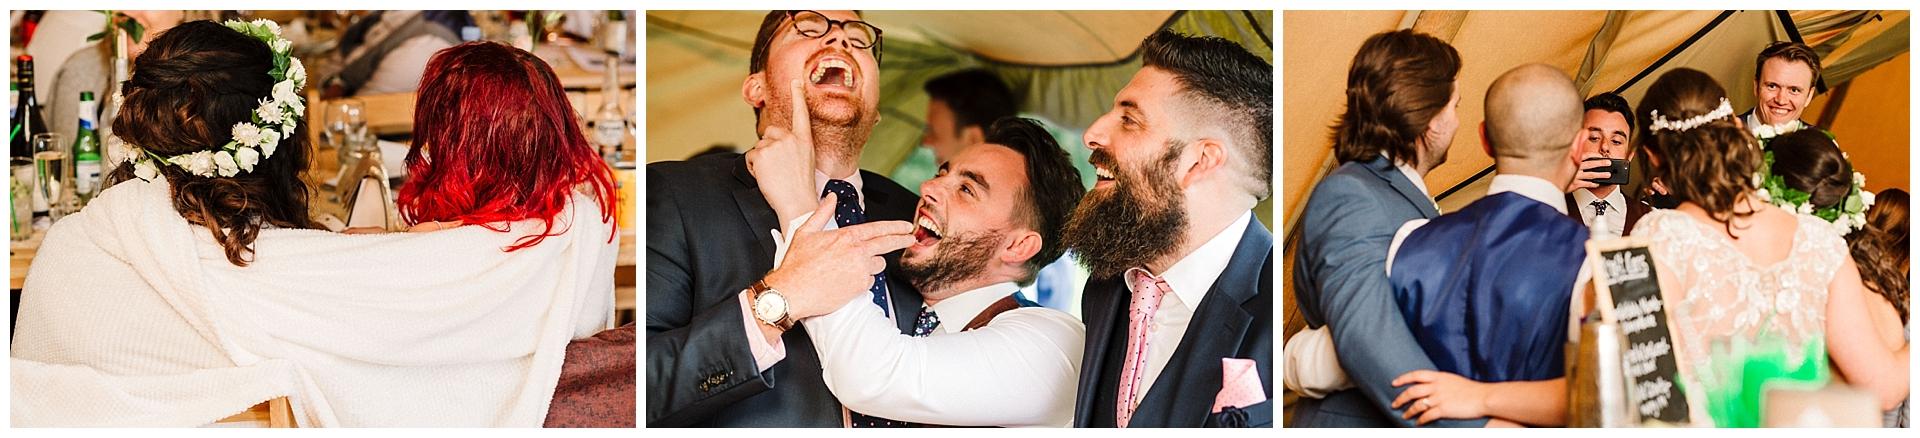 wedding guests at a yorkshire tipi wedding bar events uk